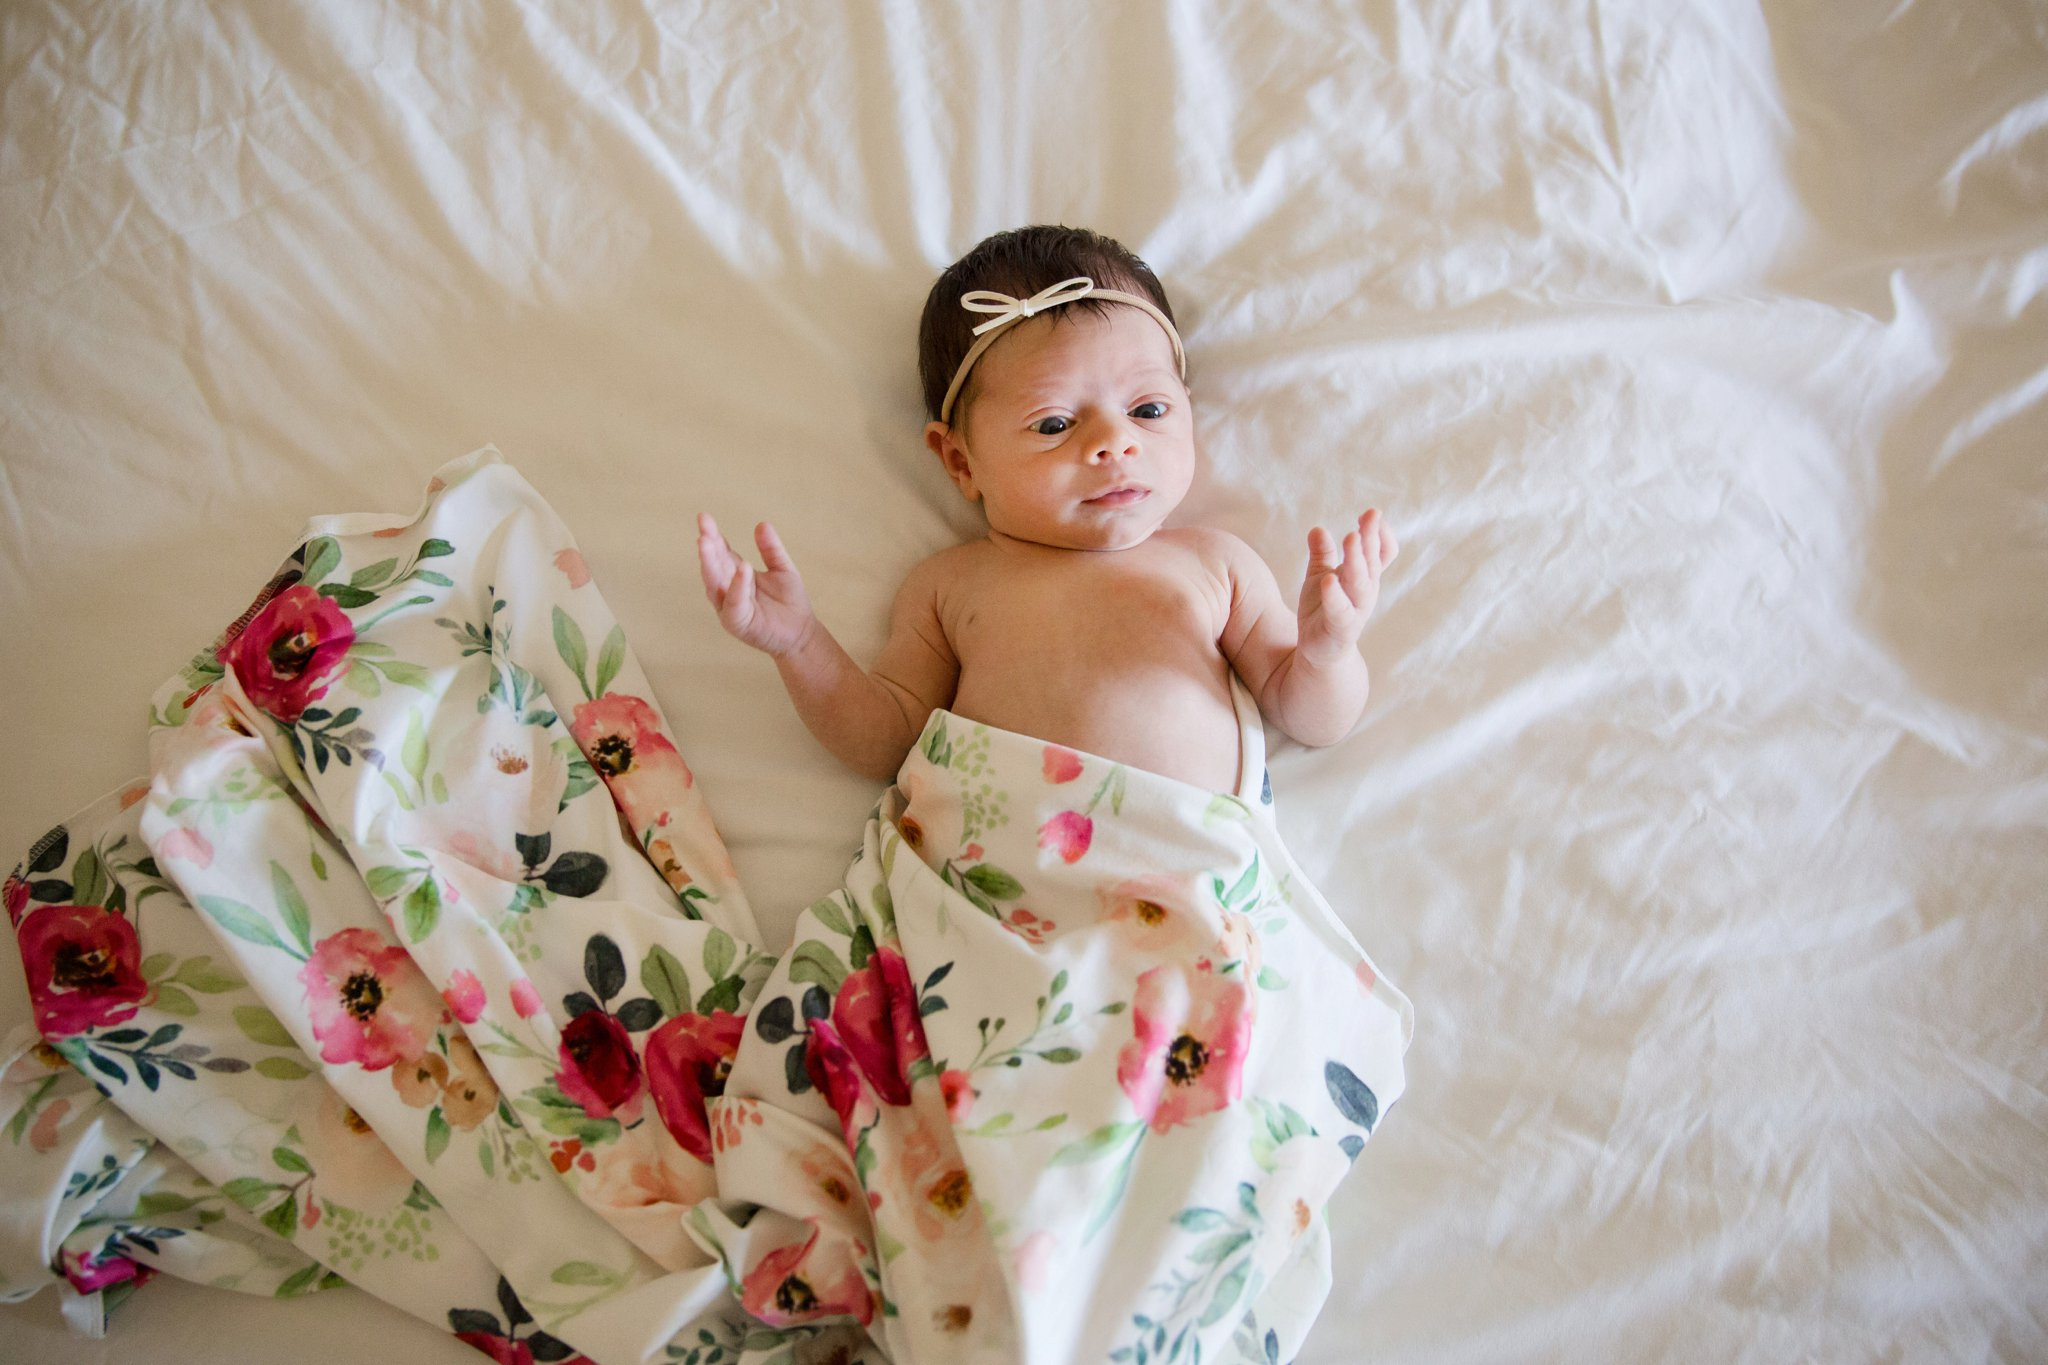 lubbock-lifestyle-newborn-photographer21.jpg